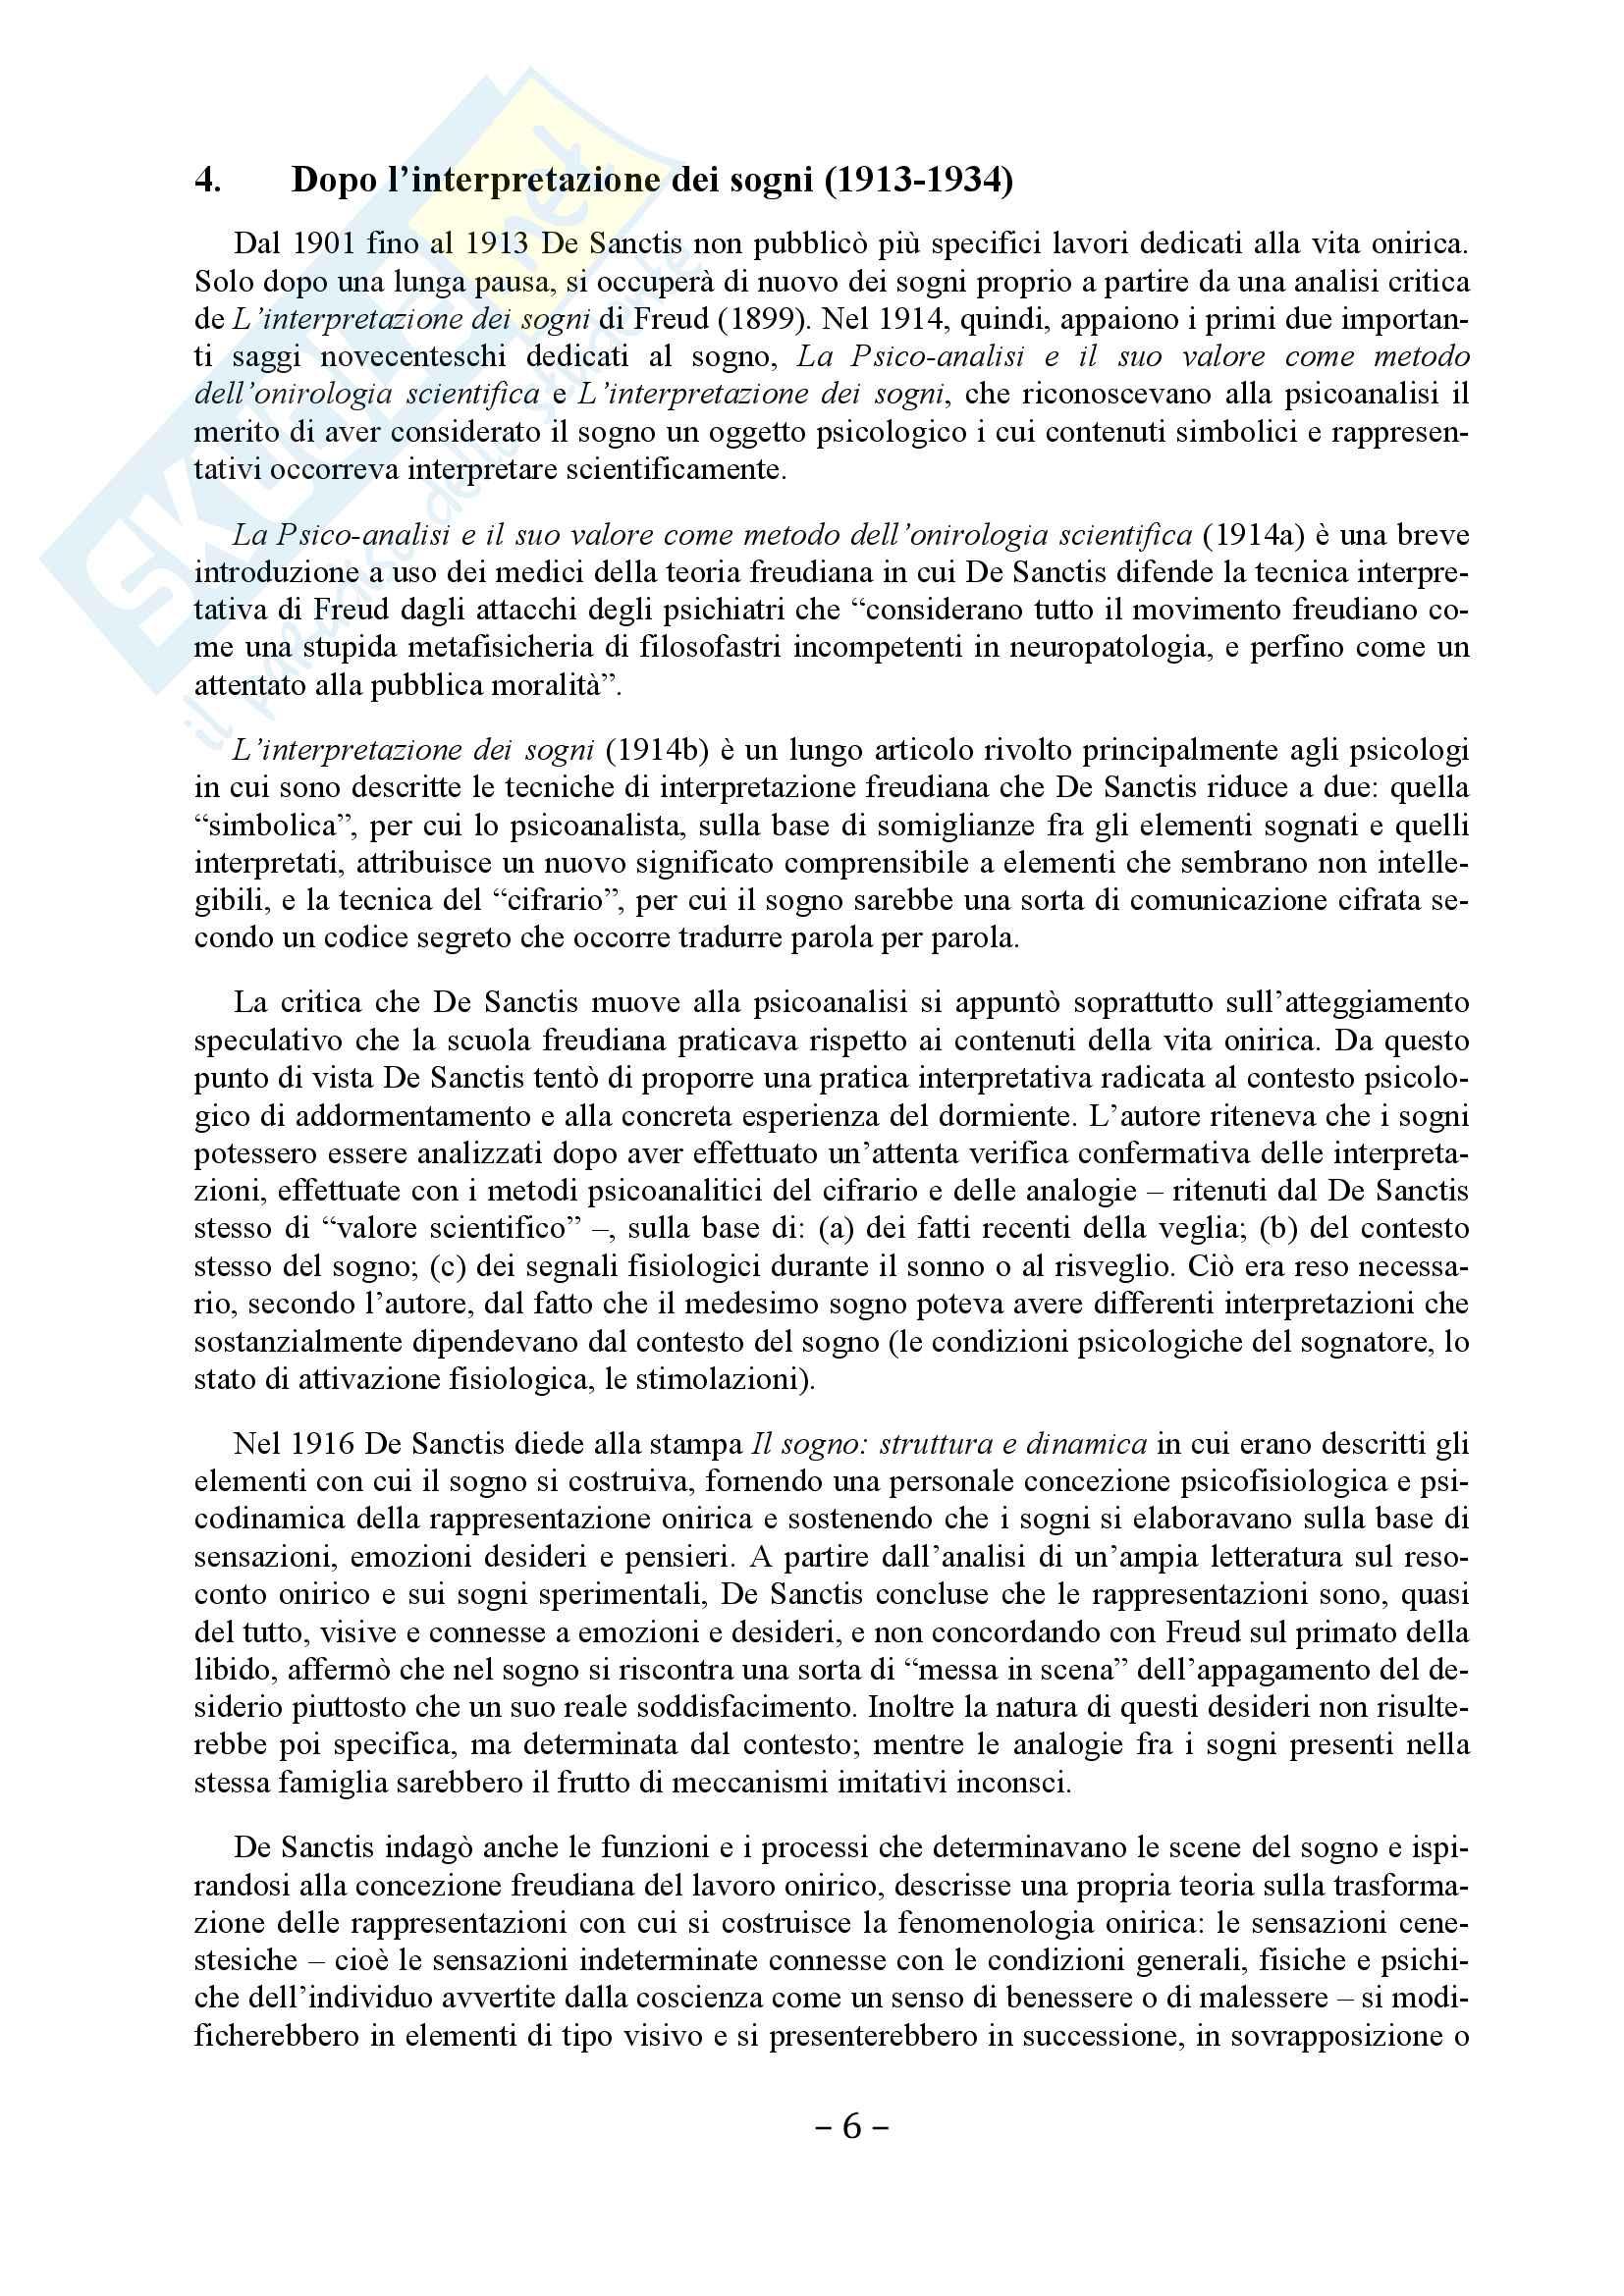 Storia della Psicologia - Tesina su Sante De Sanctis Pag. 6